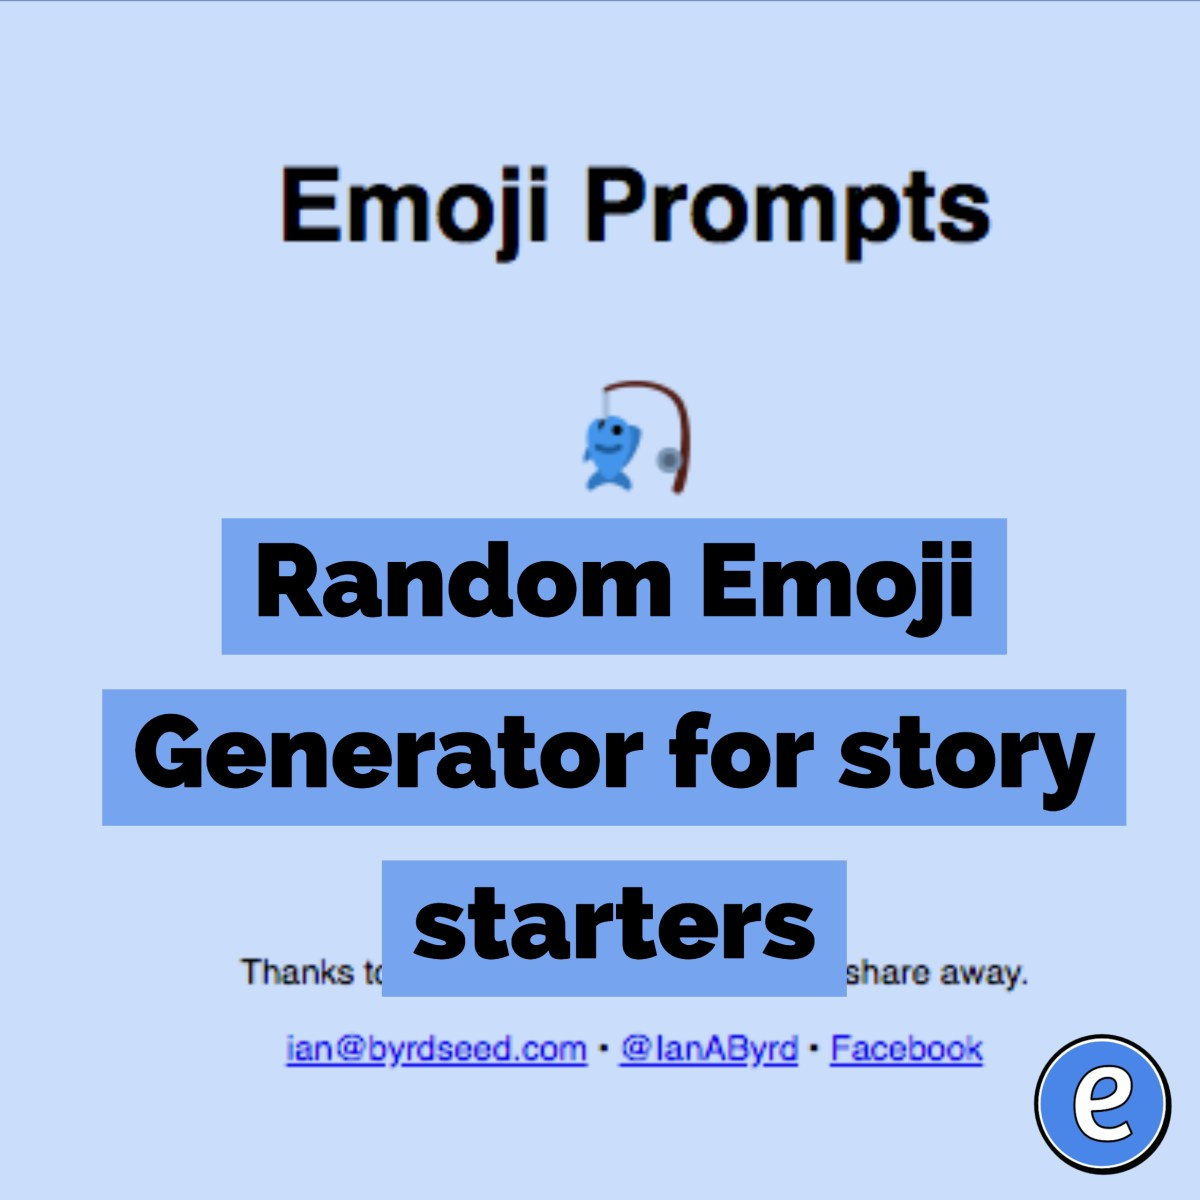 Random Emoji Generator for story starters